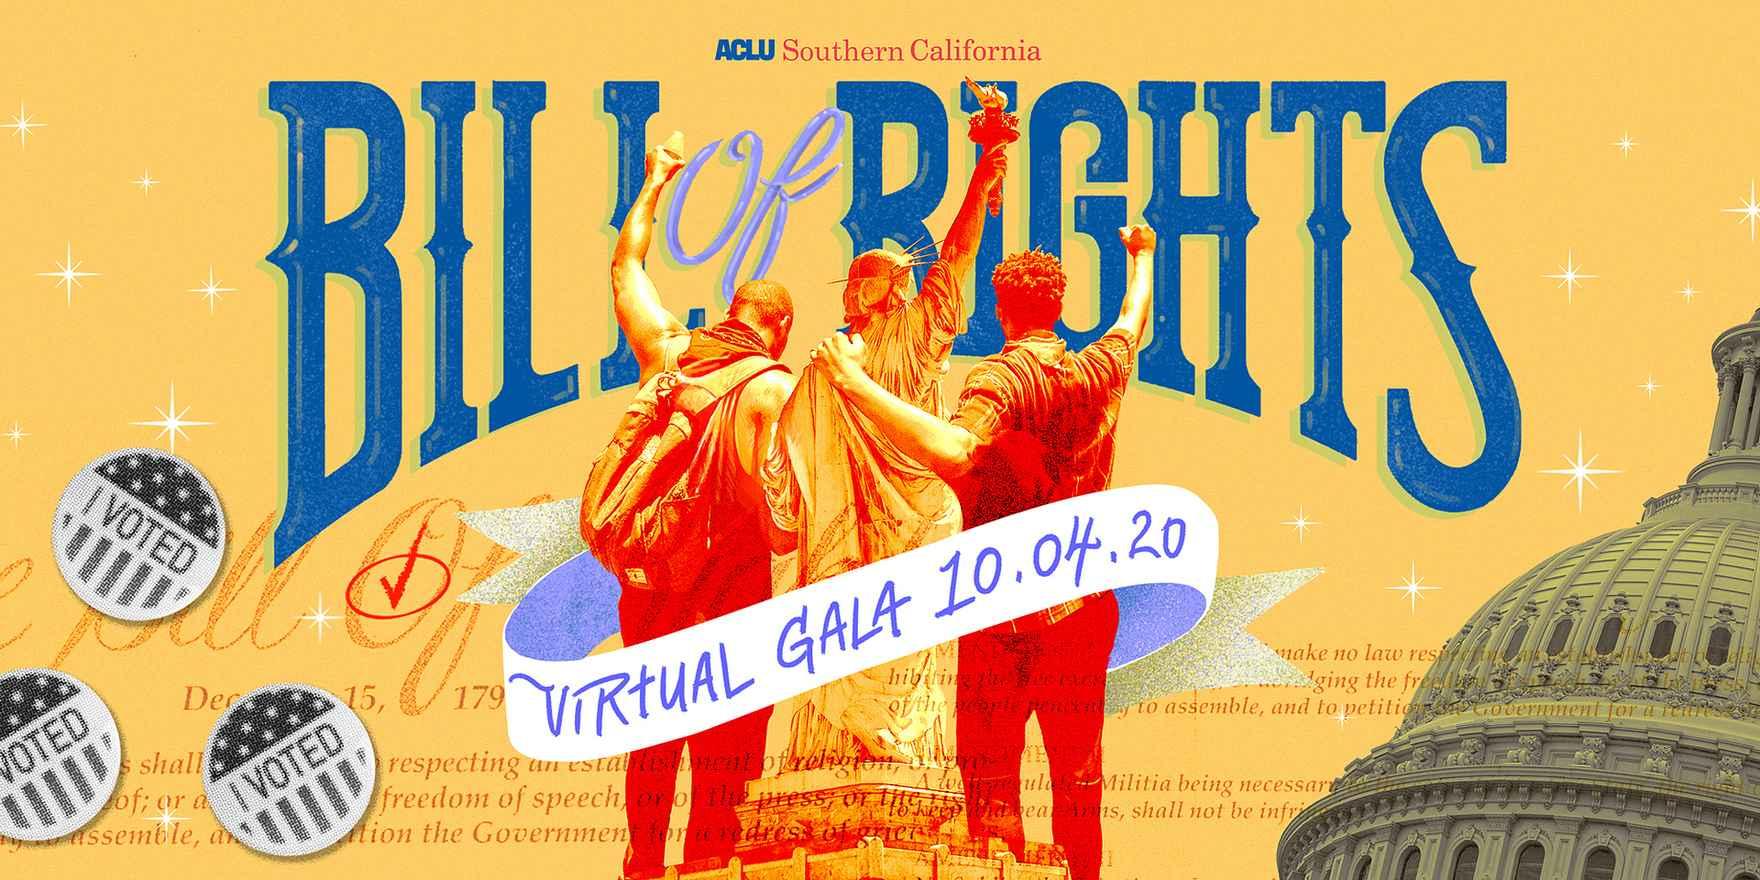 ACLU-BillofRights-Banner_1000x2000